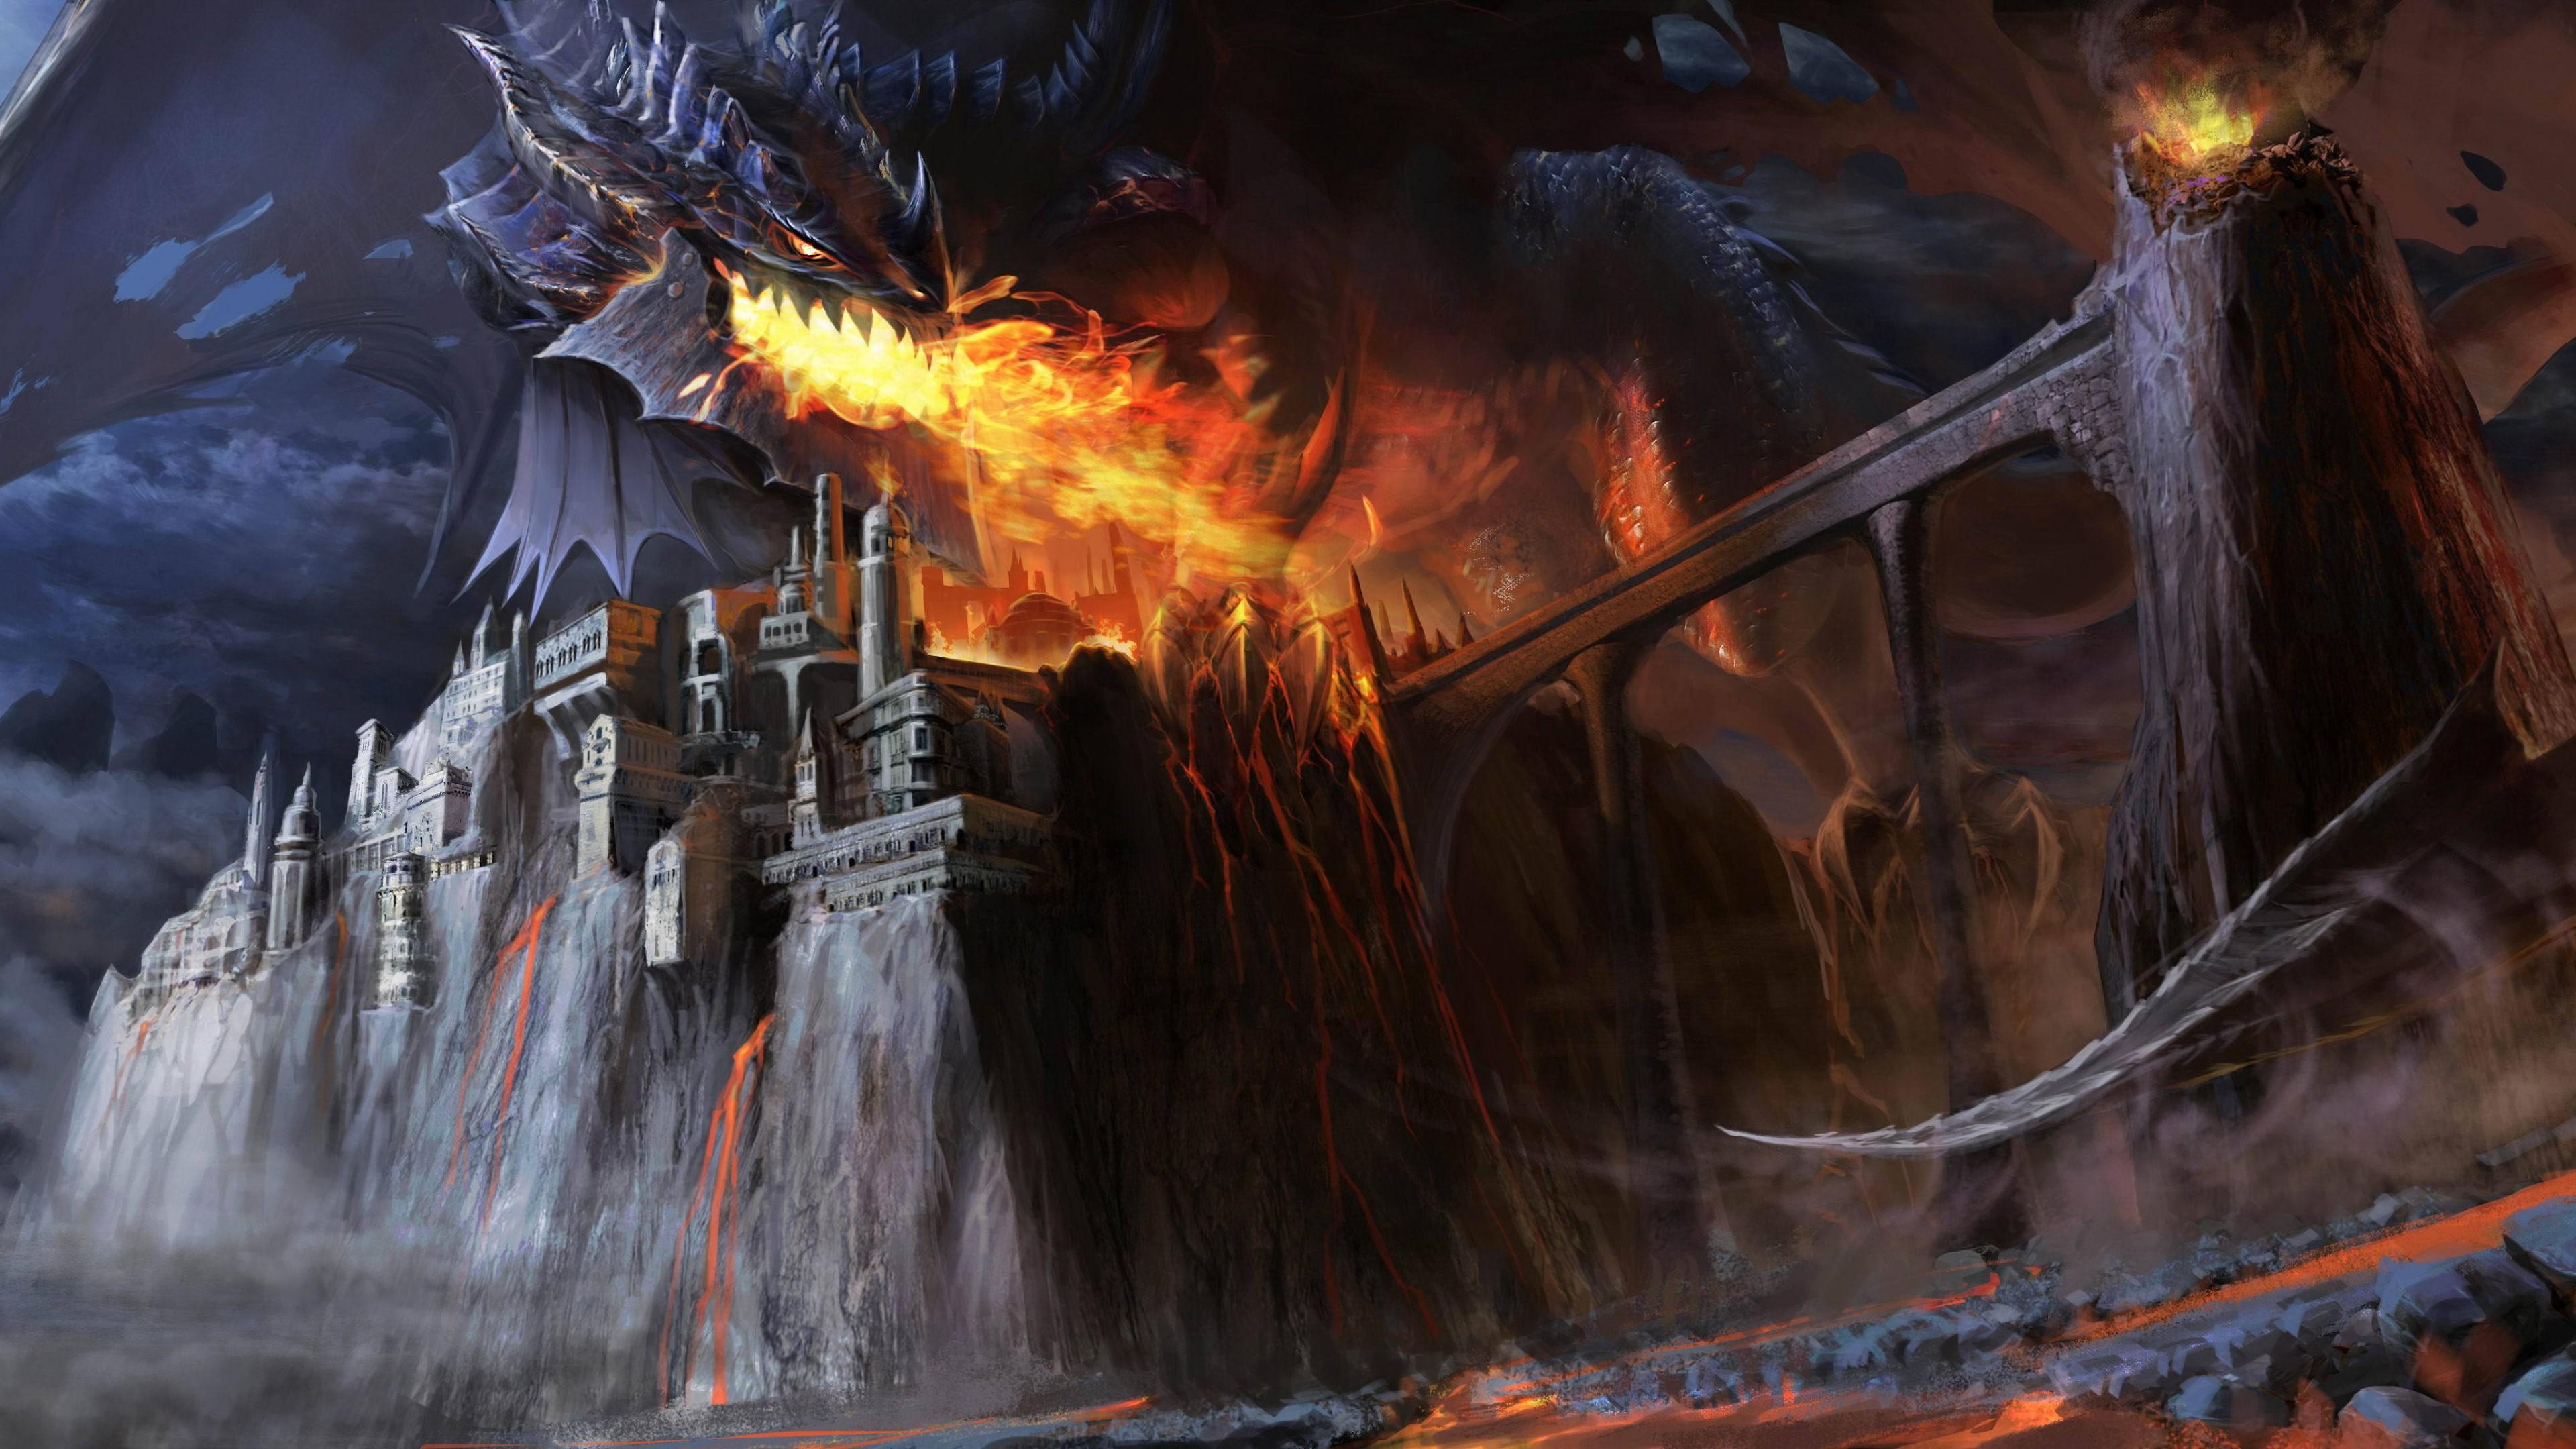 White Wallpaper Iphone 5 Wallpaper Dragon Black Fire Castle Bridge Lava Smoke